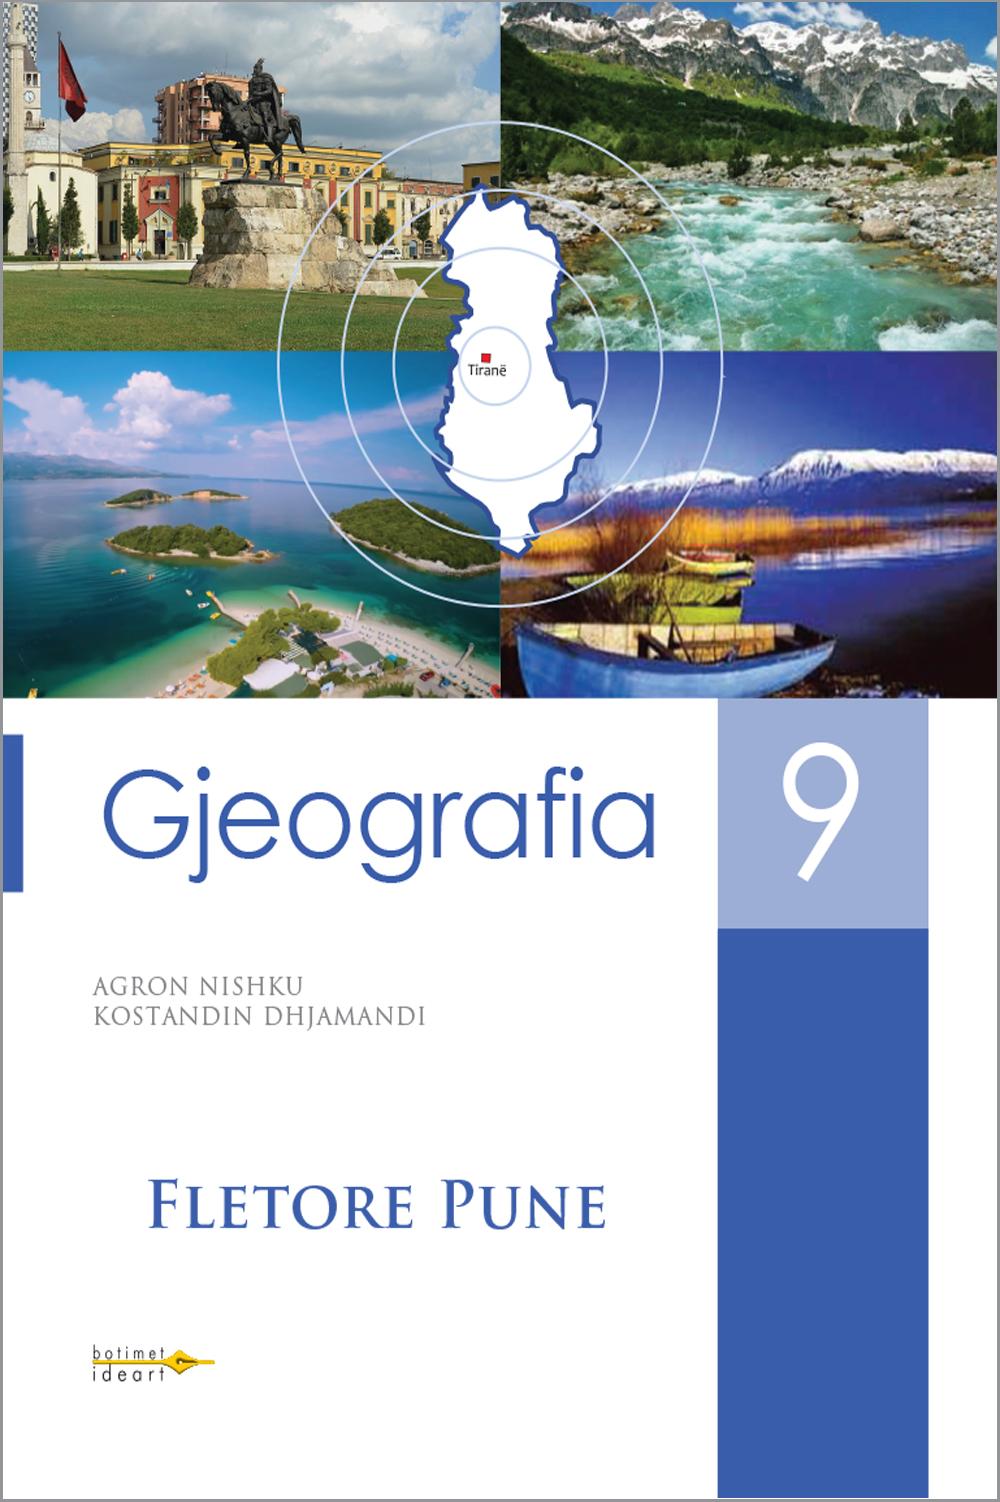 Fletore pune<br>Gjeografia 9